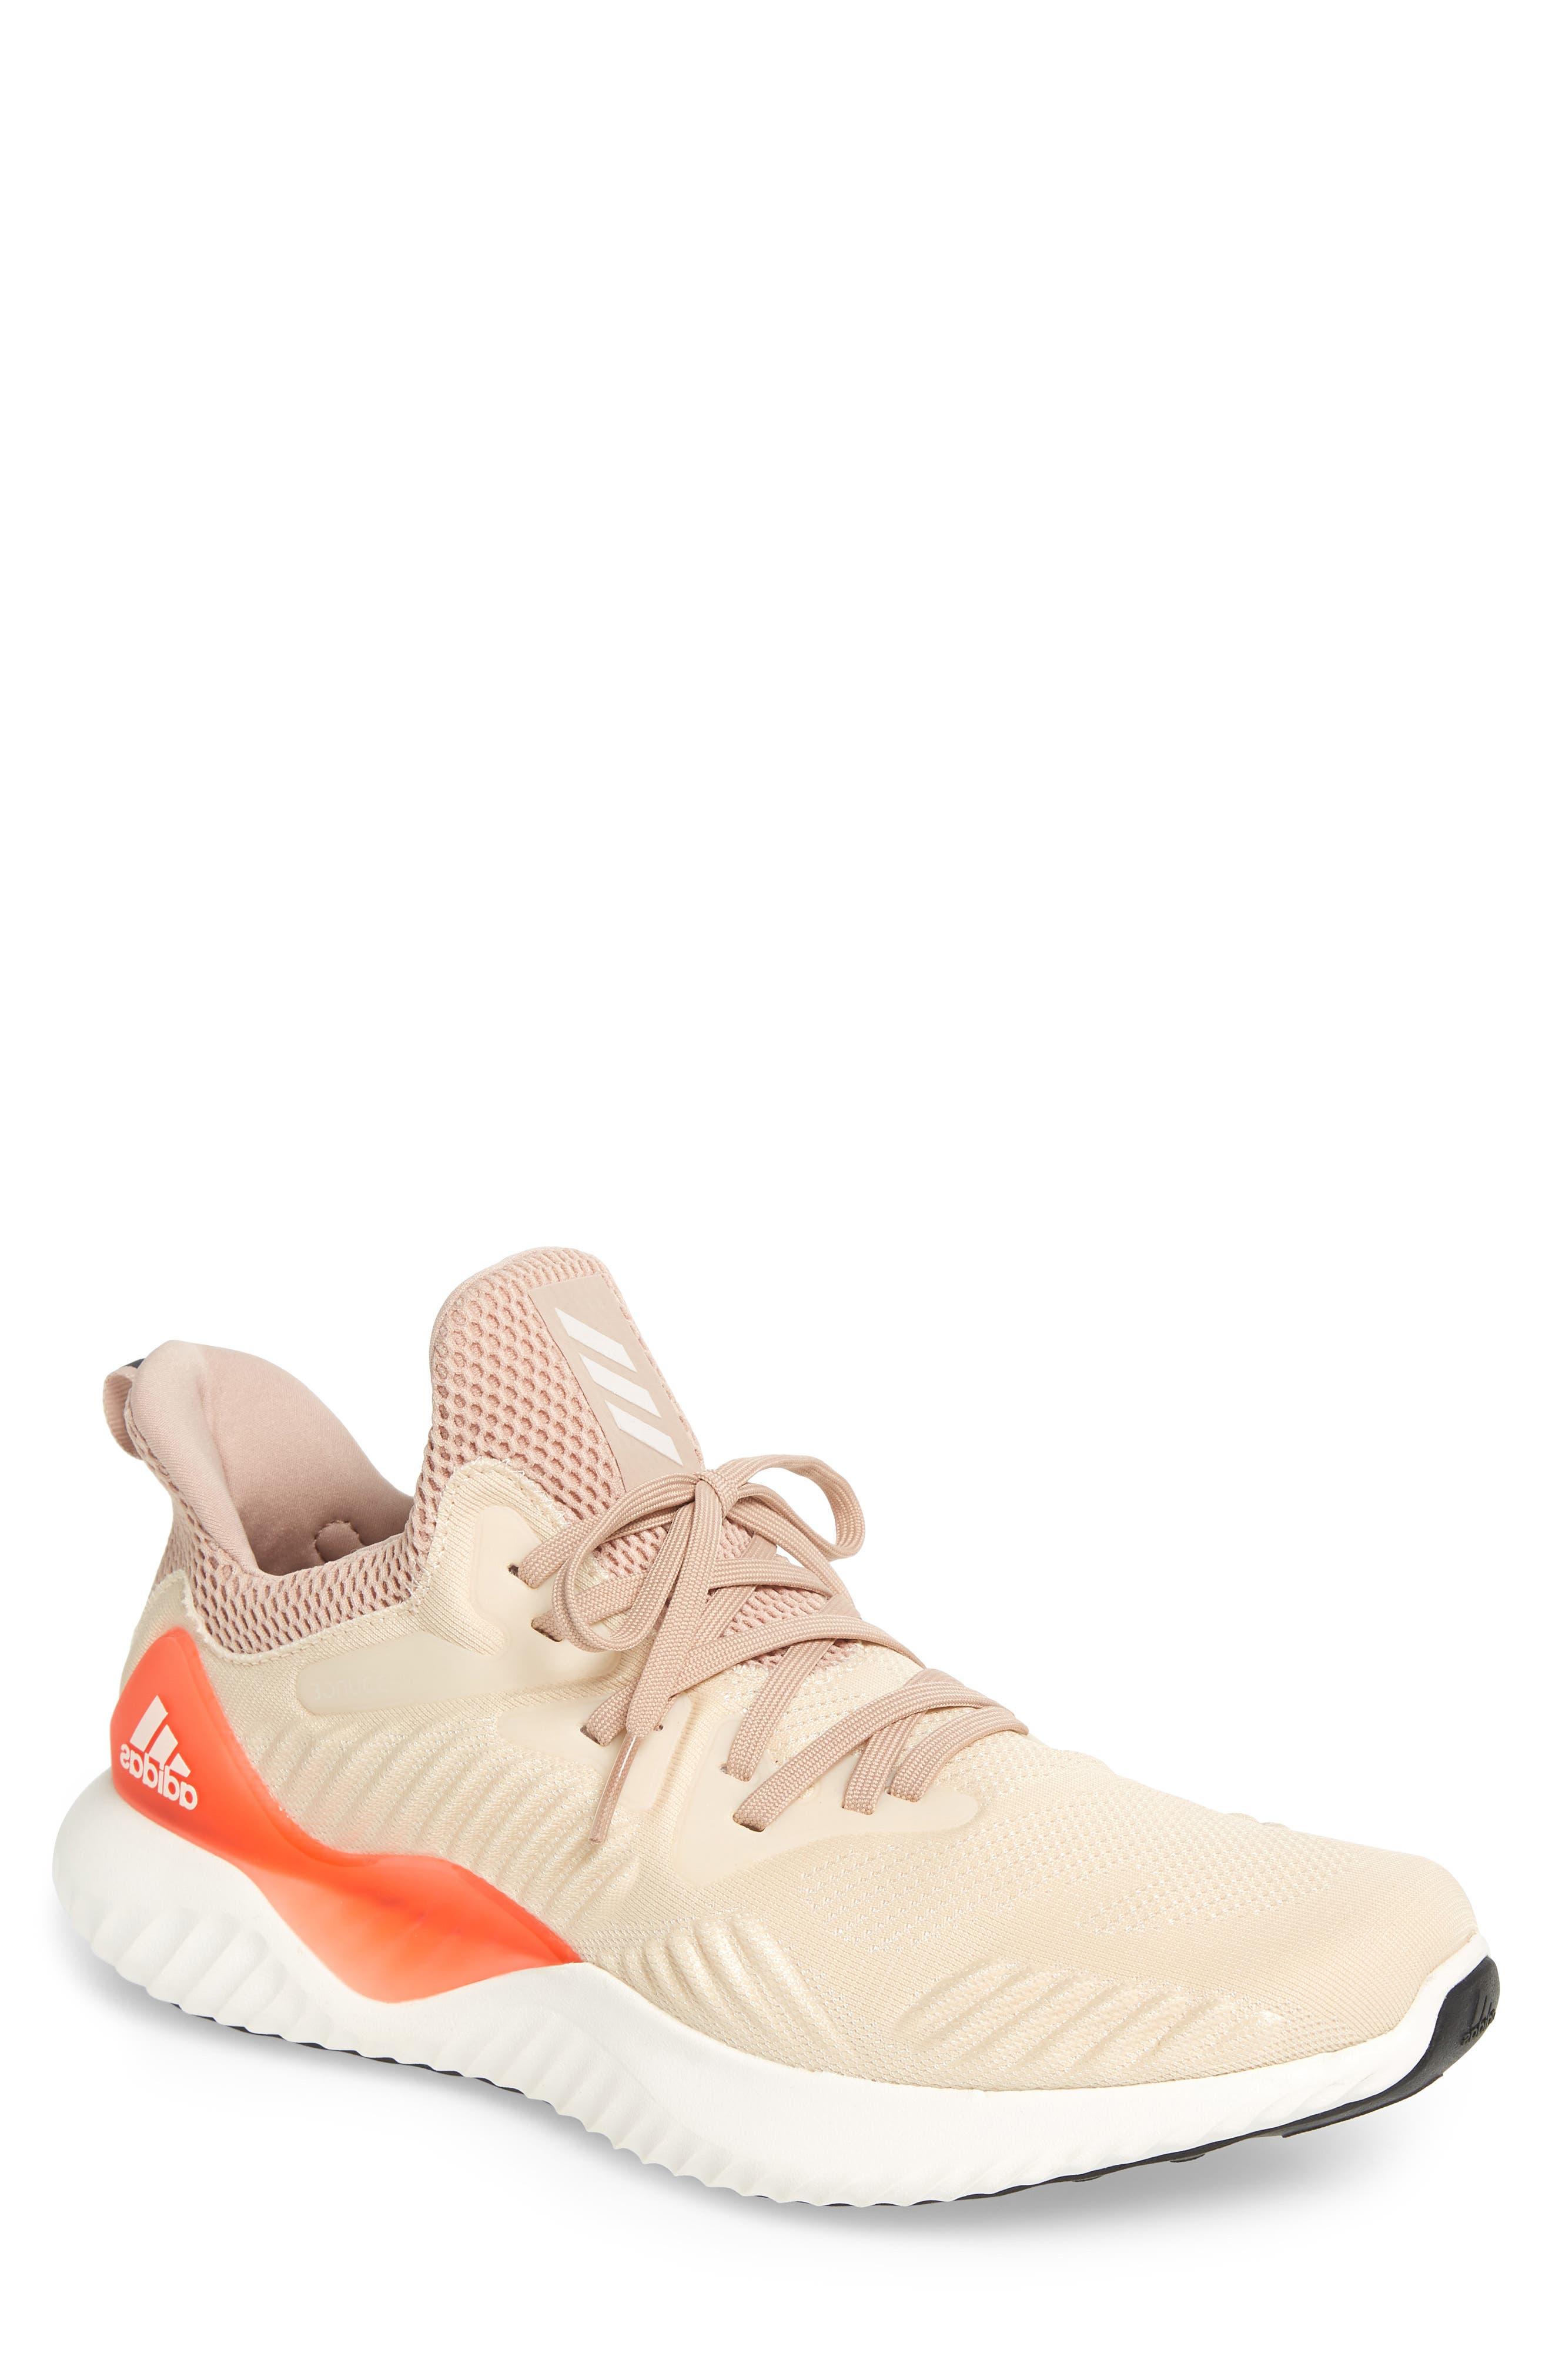 AlphaBounce Beyond Knit Running Shoe,                         Main,                         color, Linen/ White/ Asphalt